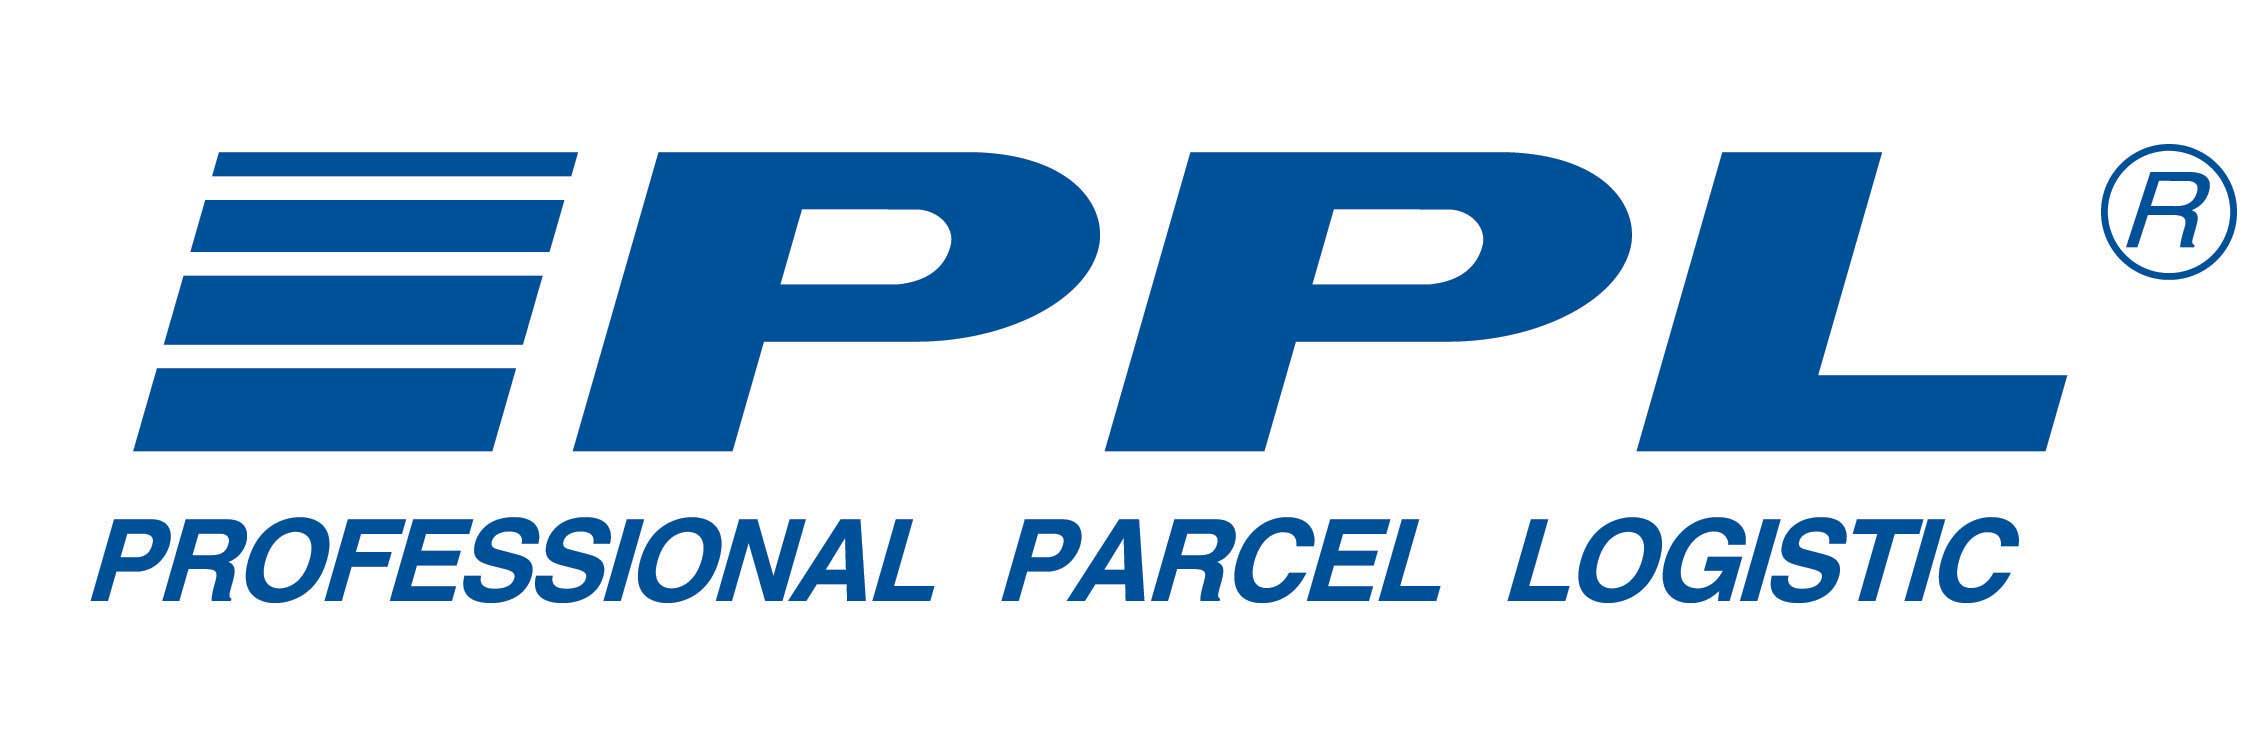 ppl_cz_logo